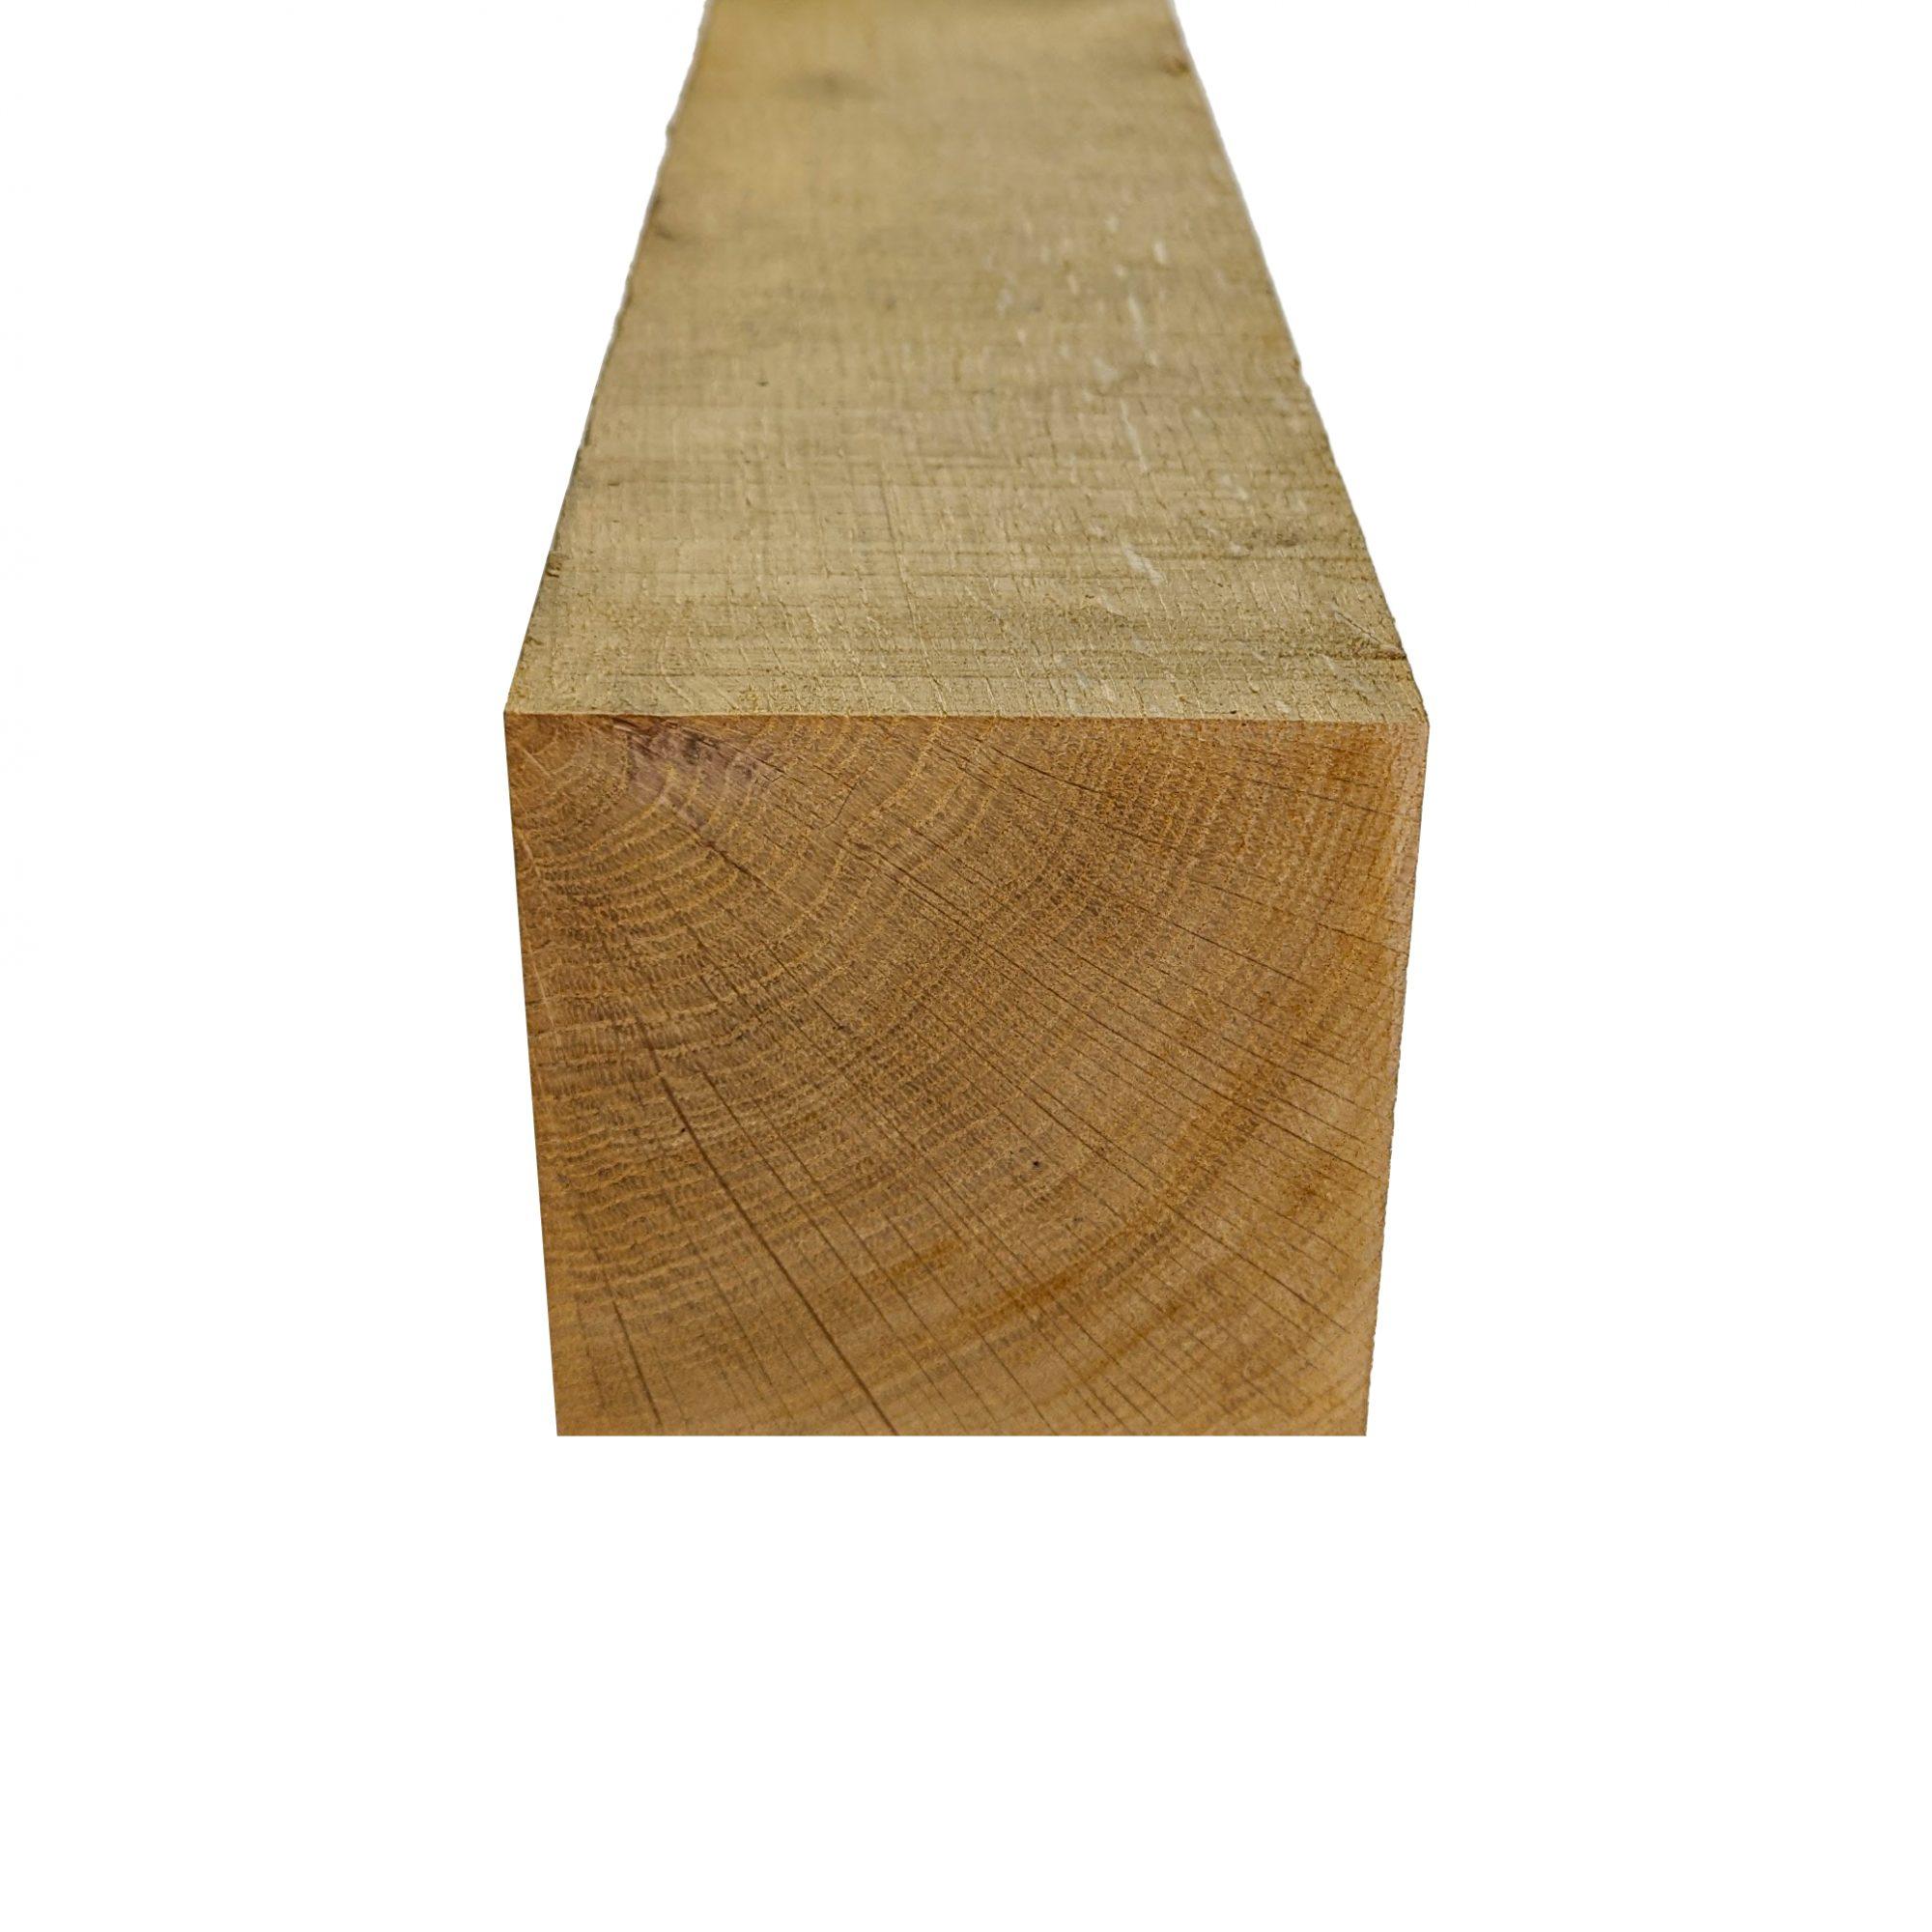 Fresh Sawn Oak Posts 100x100 Beams 3m Yandle Sons Ltd